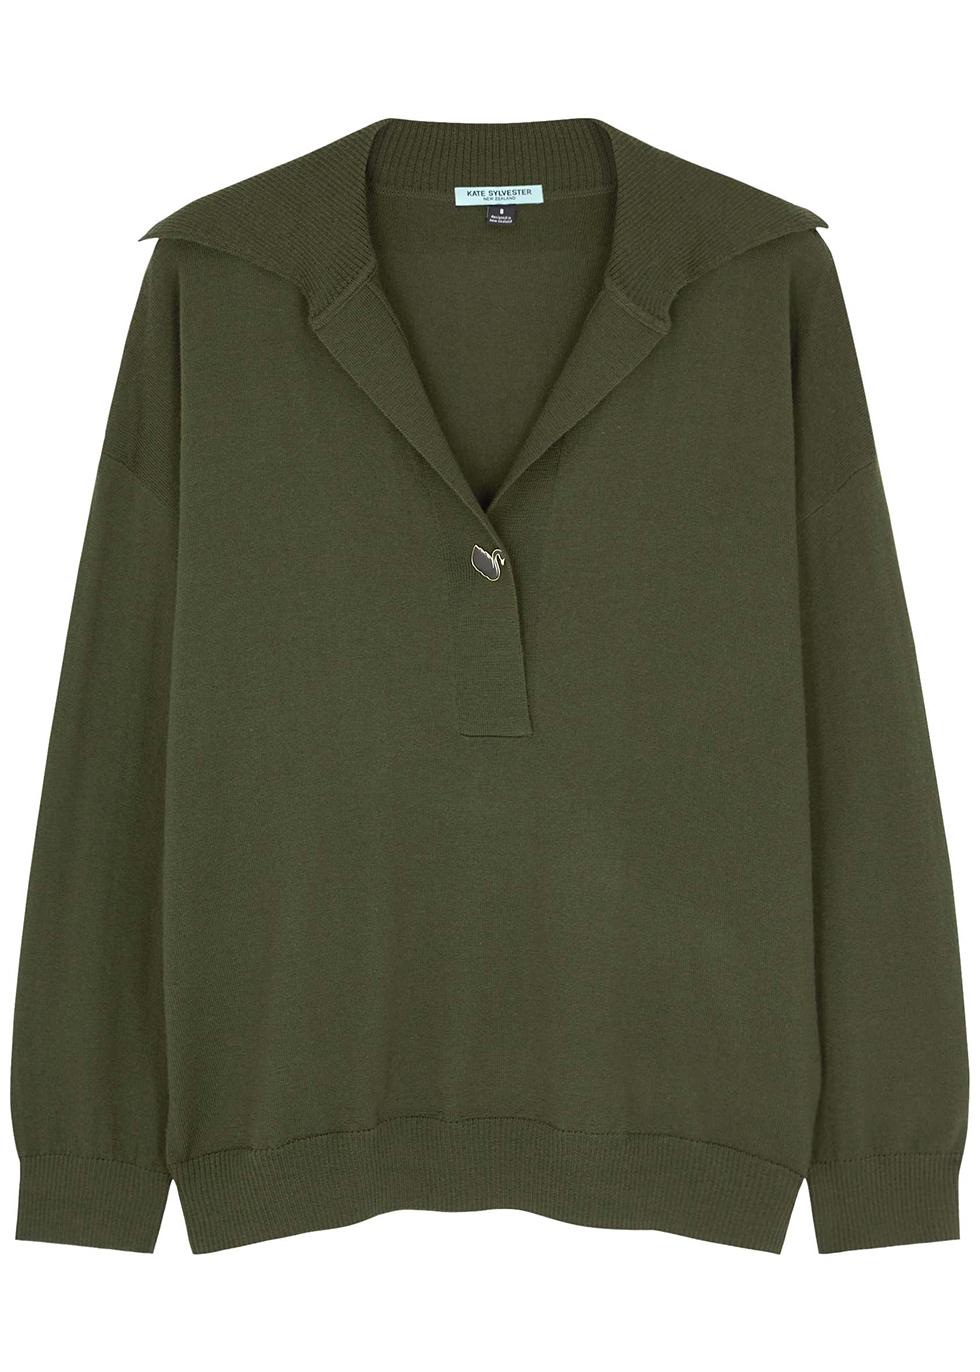 Hilary green wool jumper